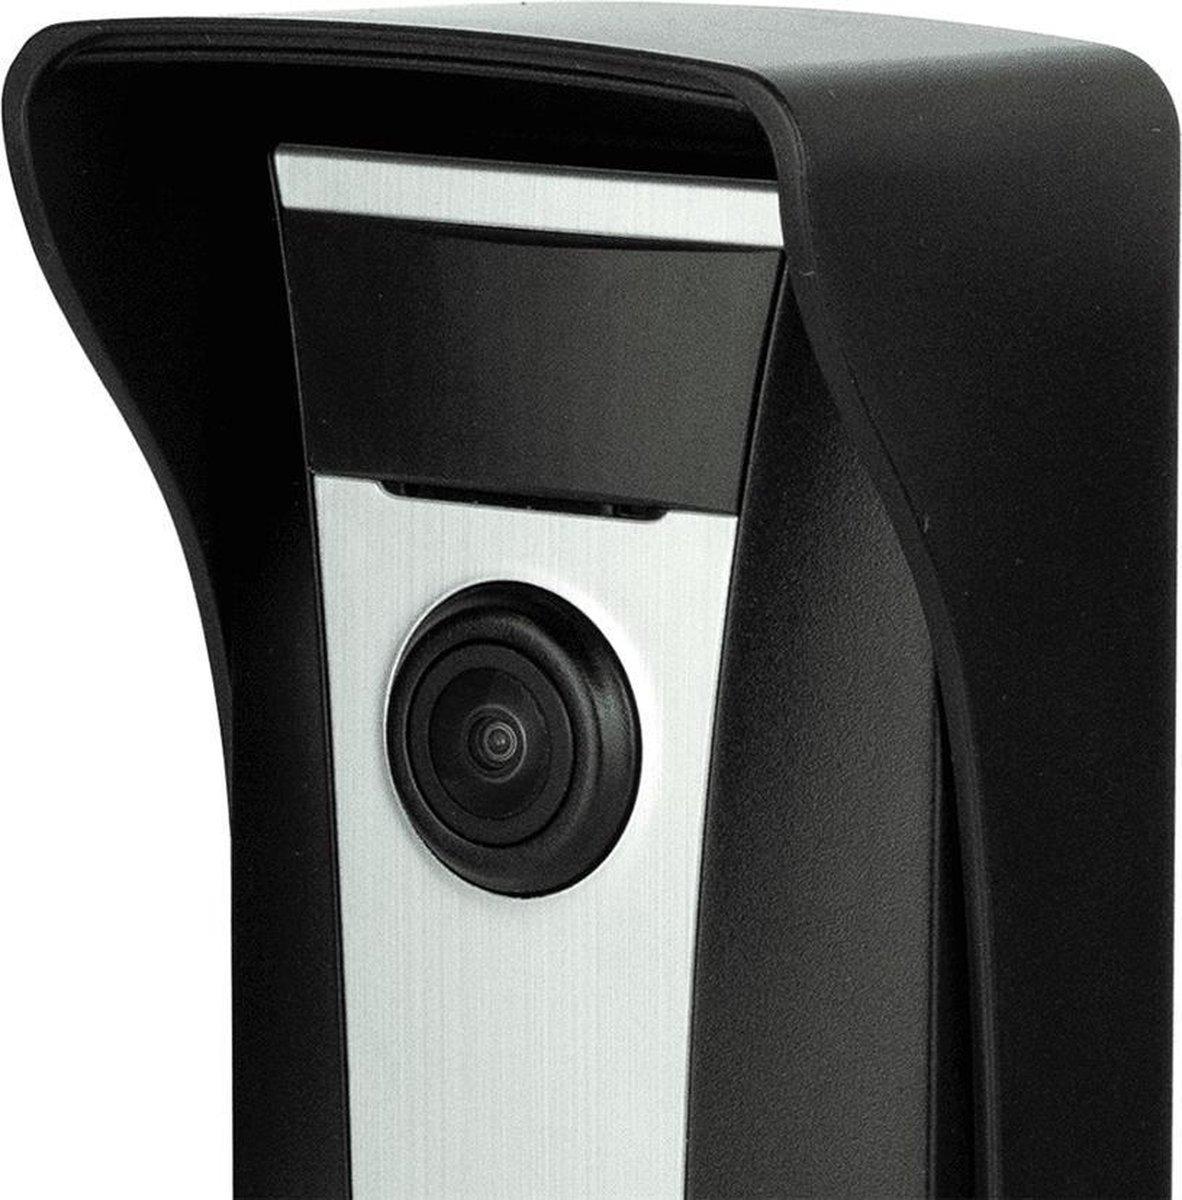 Burg Wächter videobel - DG8500 - IP55 - 720P - WiFi